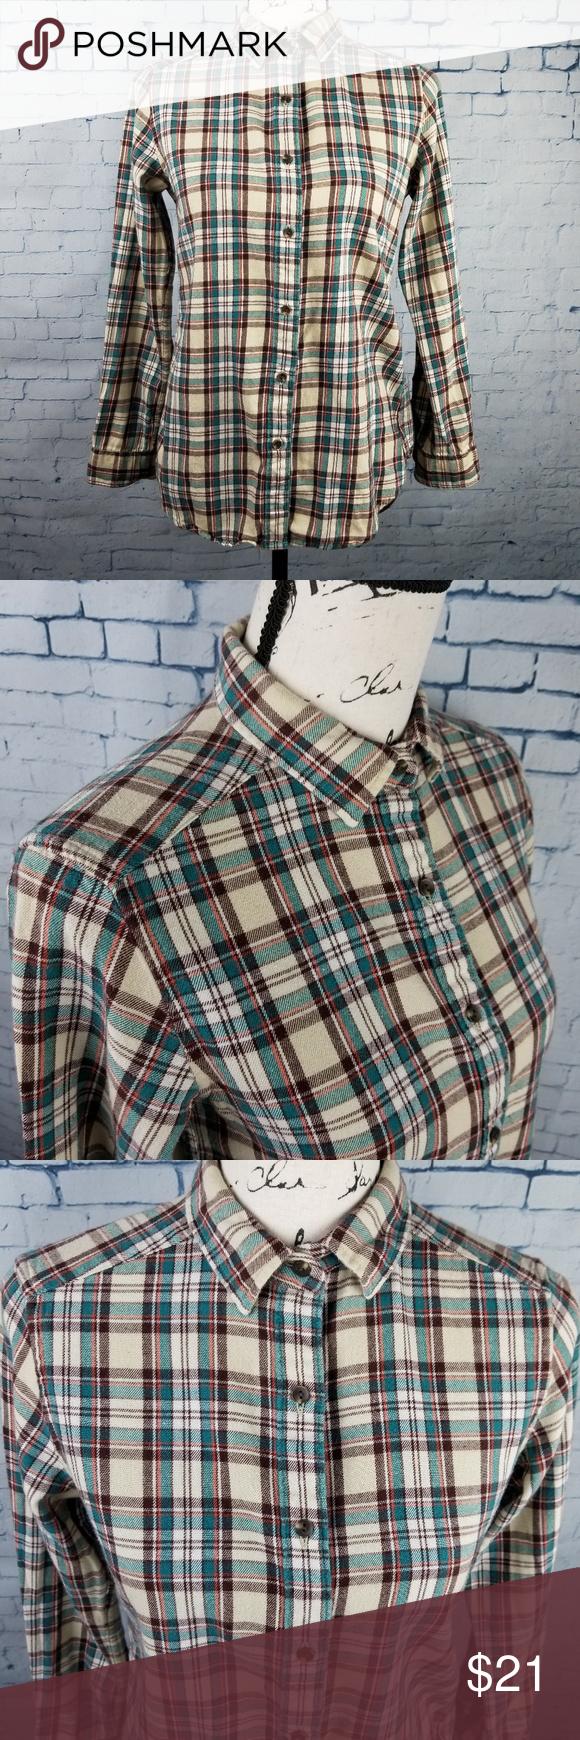 Uniqlo Womenus Flannel Button Down Shirt Size Med  Pinterest